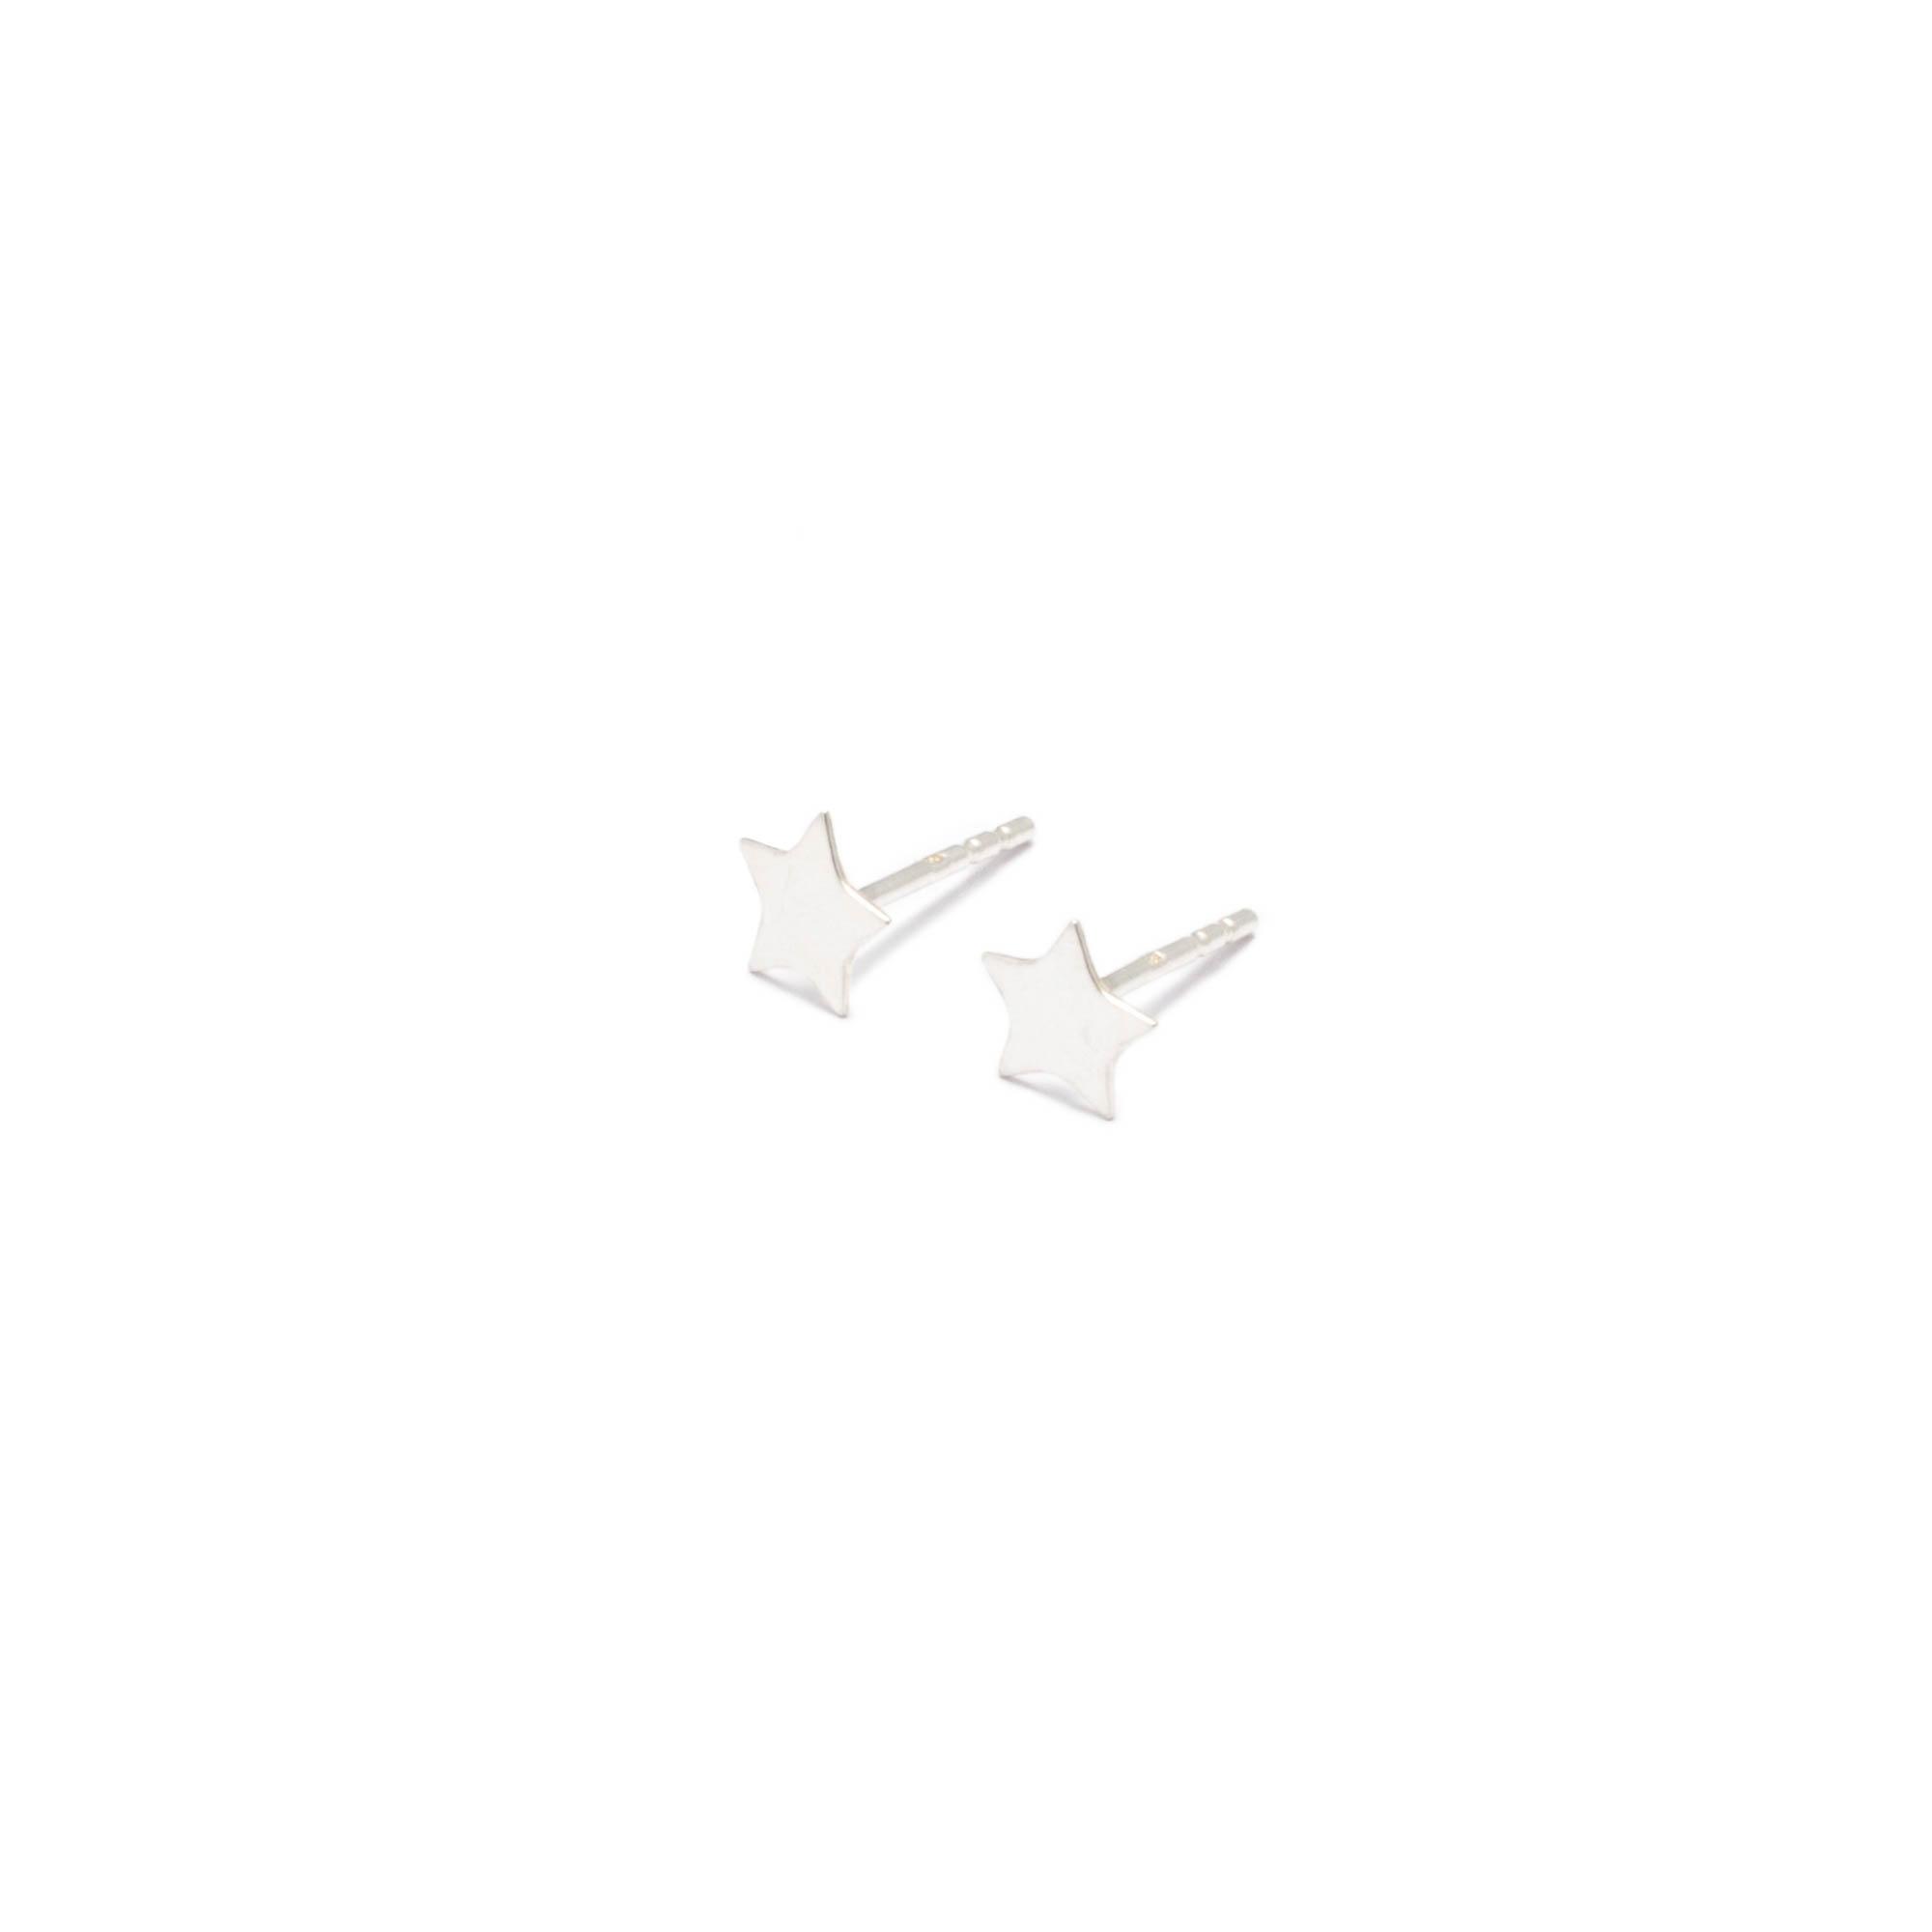 schmuck, ohrringe, OHRRINGE STELLA | SILBER - kolczyki srebrne stella 1 1